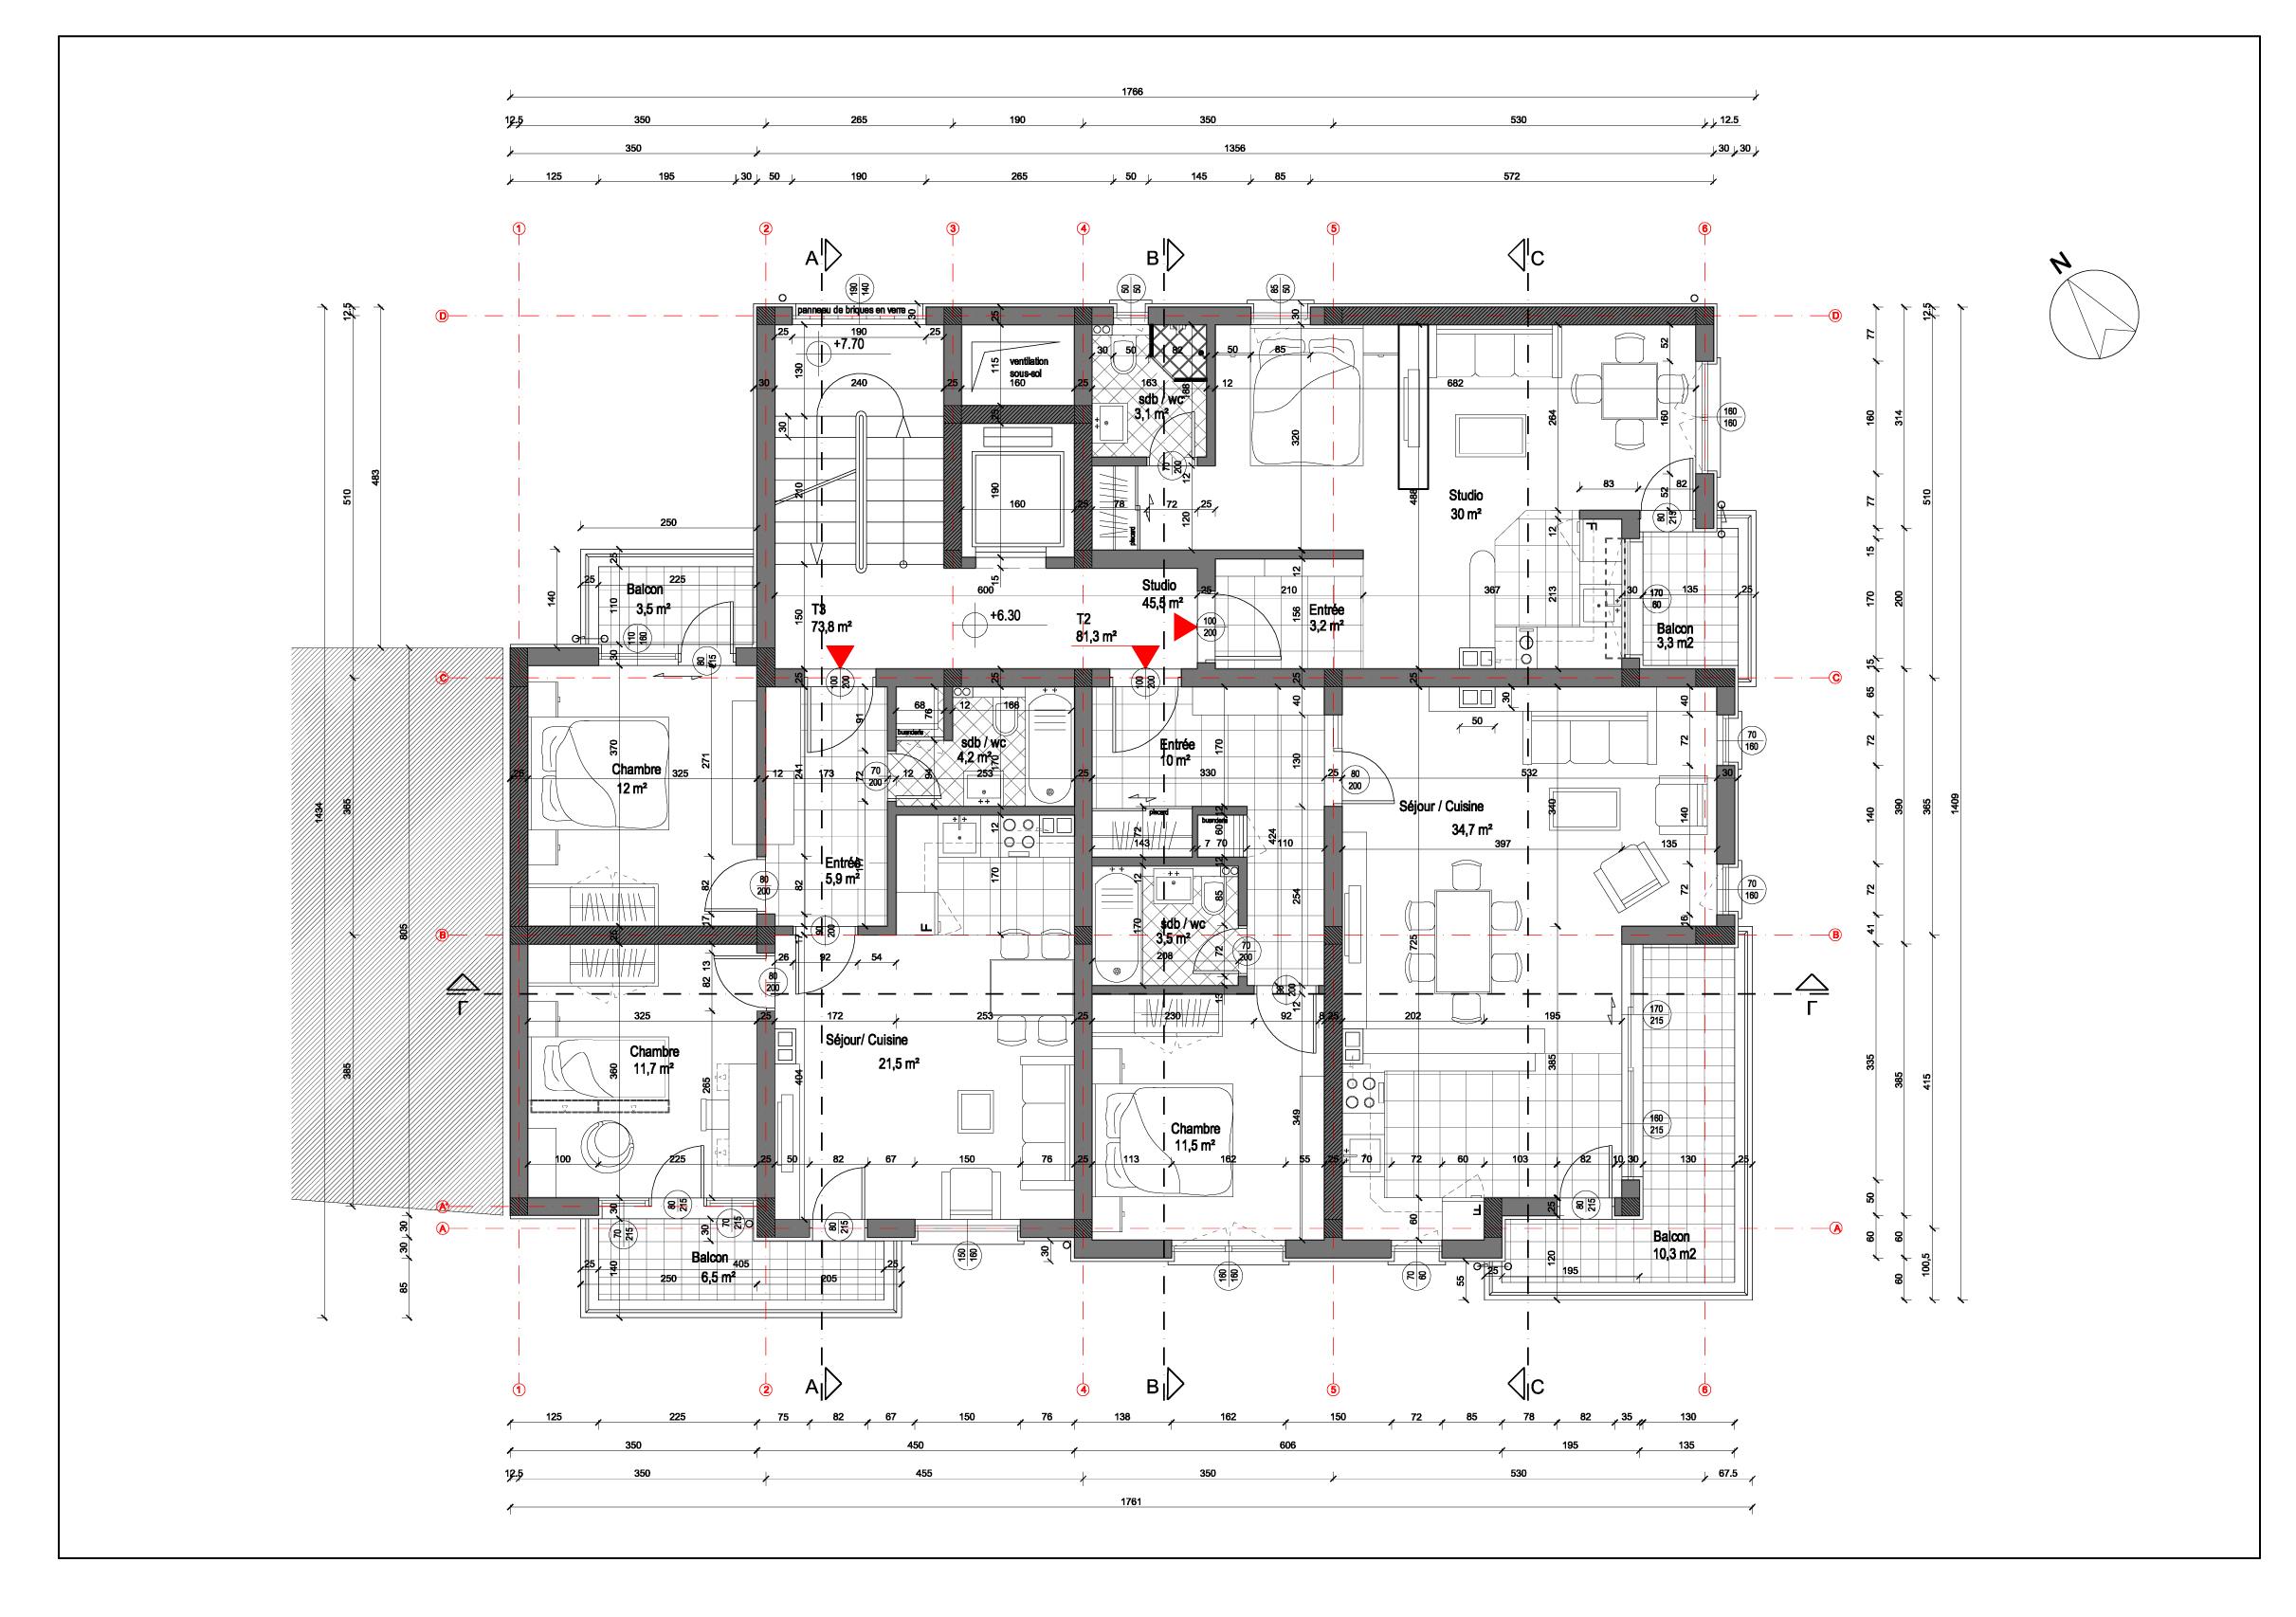 le dessin d architecture d int rieur javier jim nez david ortega pictures to pin on pinterest. Black Bedroom Furniture Sets. Home Design Ideas